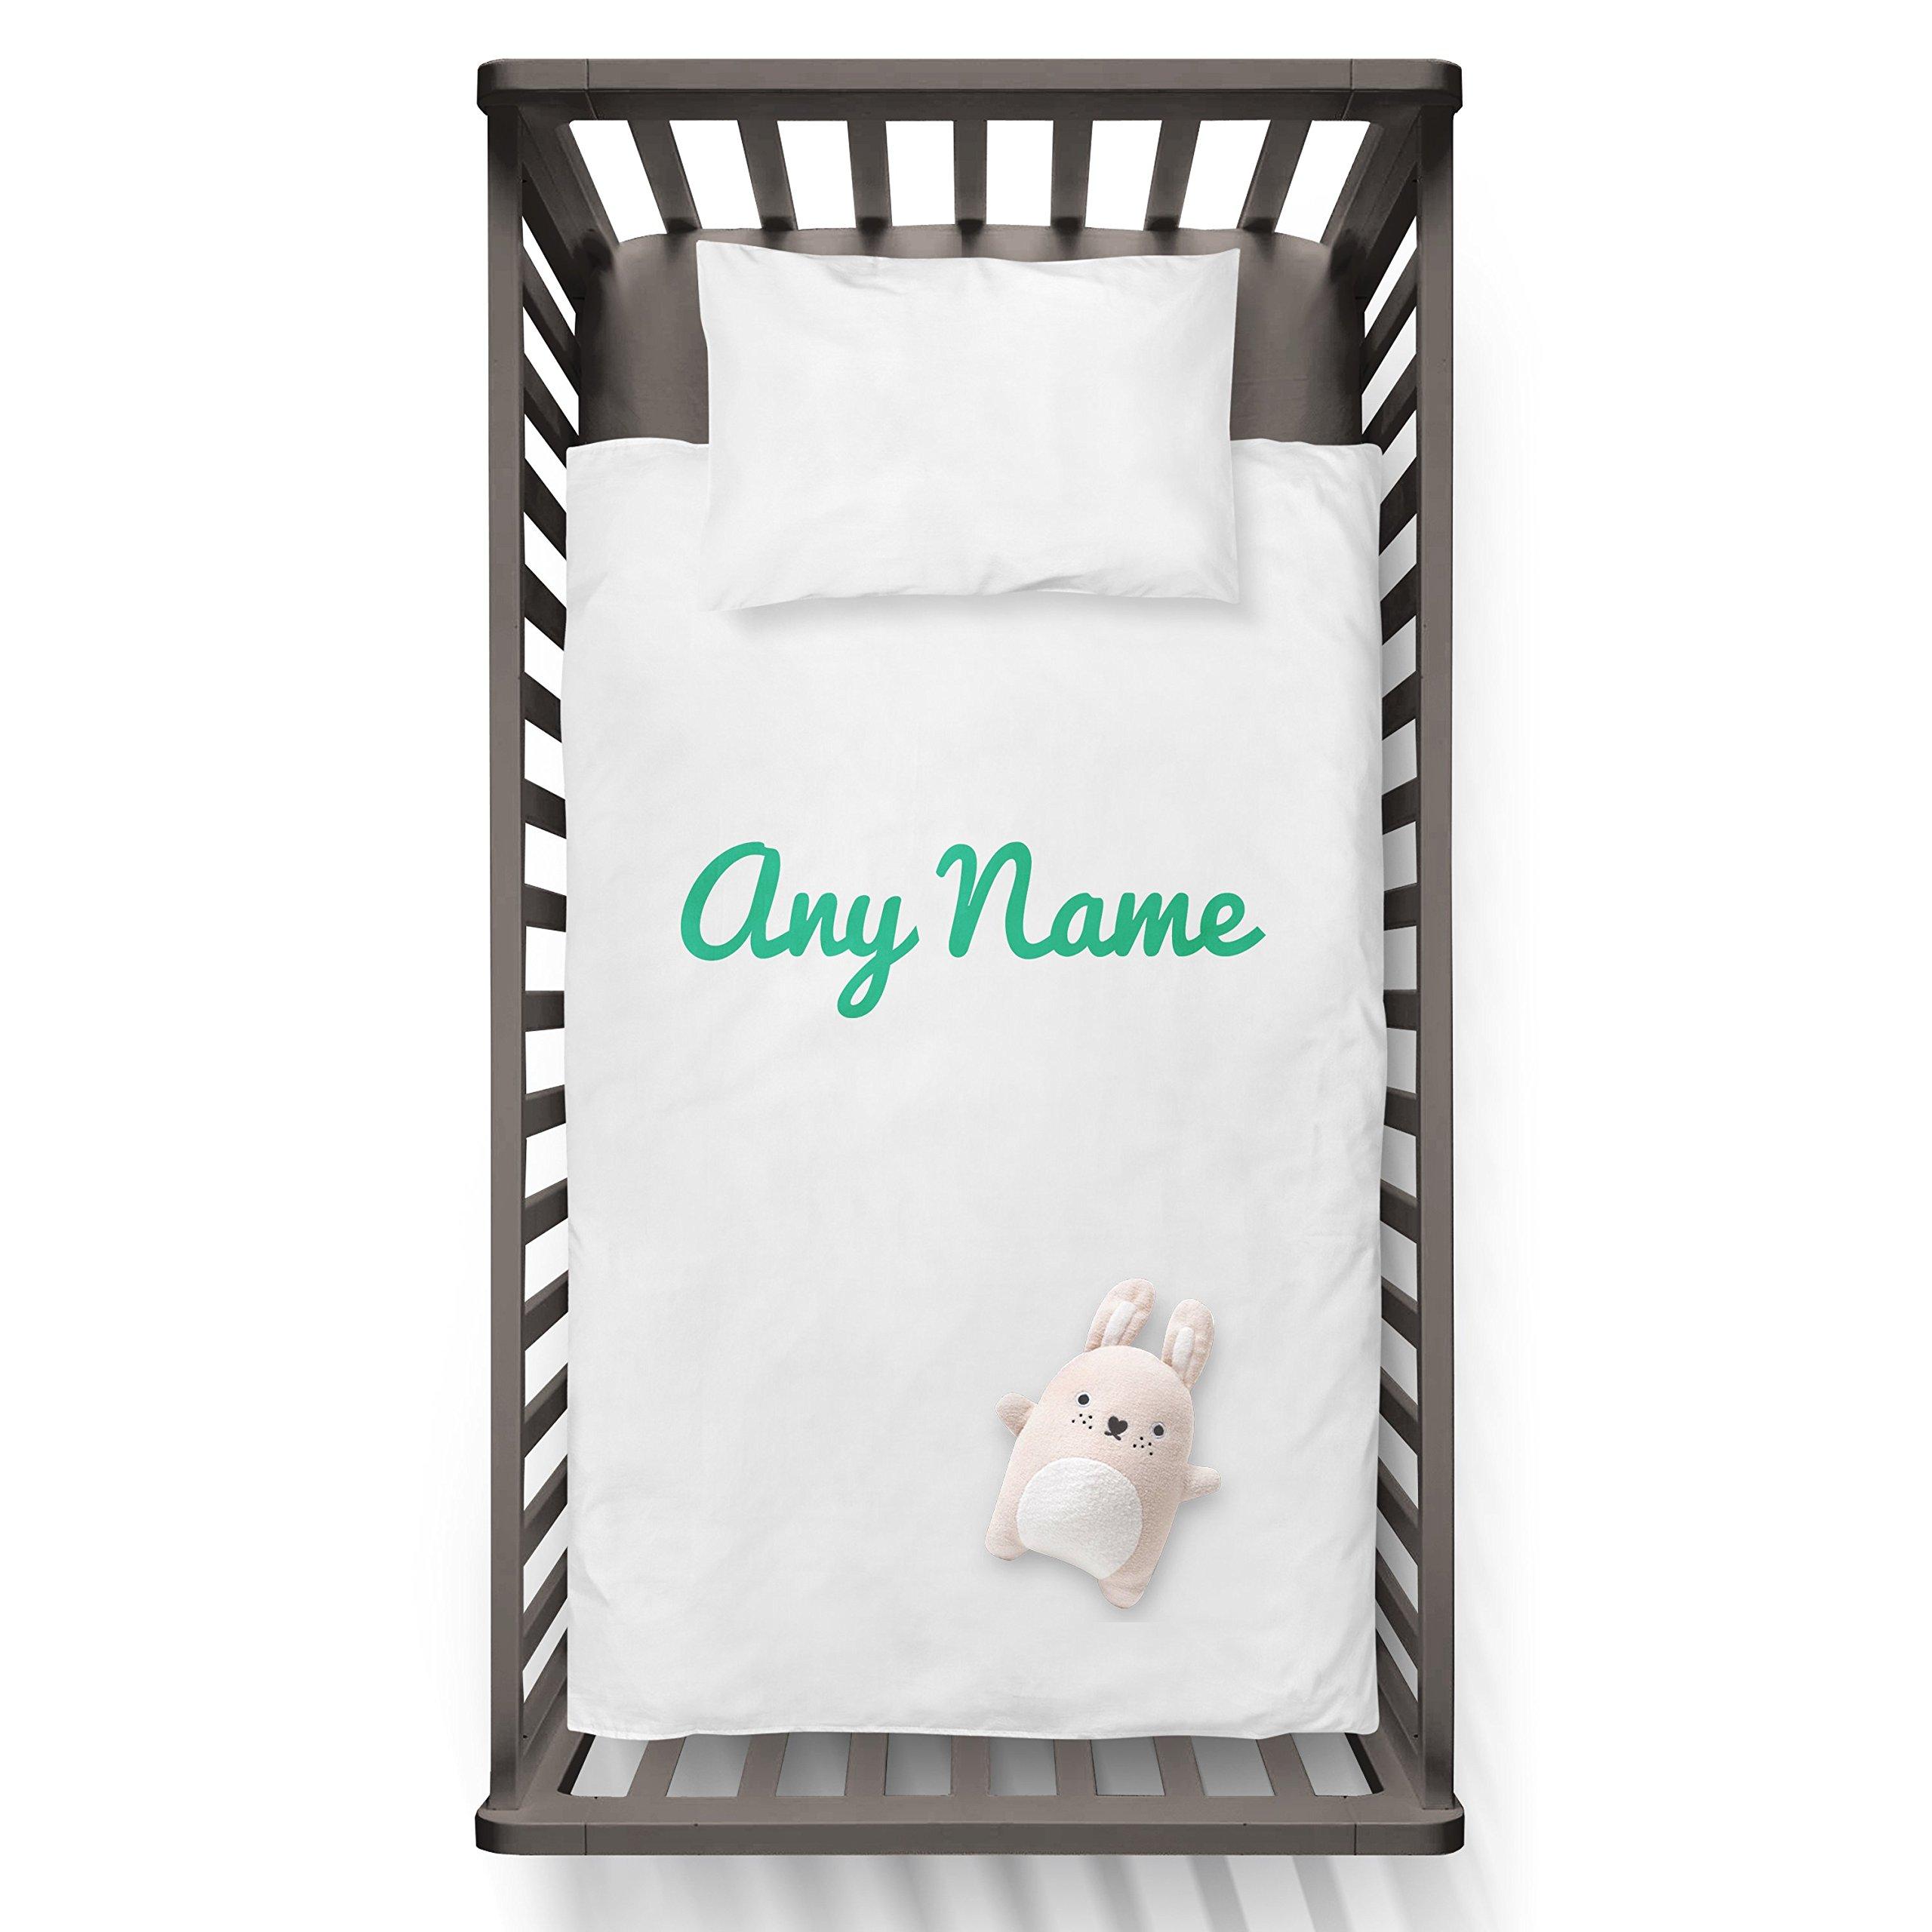 Any name Funny Humor Hip Baby Duvet /Pillow set,Toddler Duvet,Oeko-Tex,Personalized duvet and pillow,Oraganic,gift